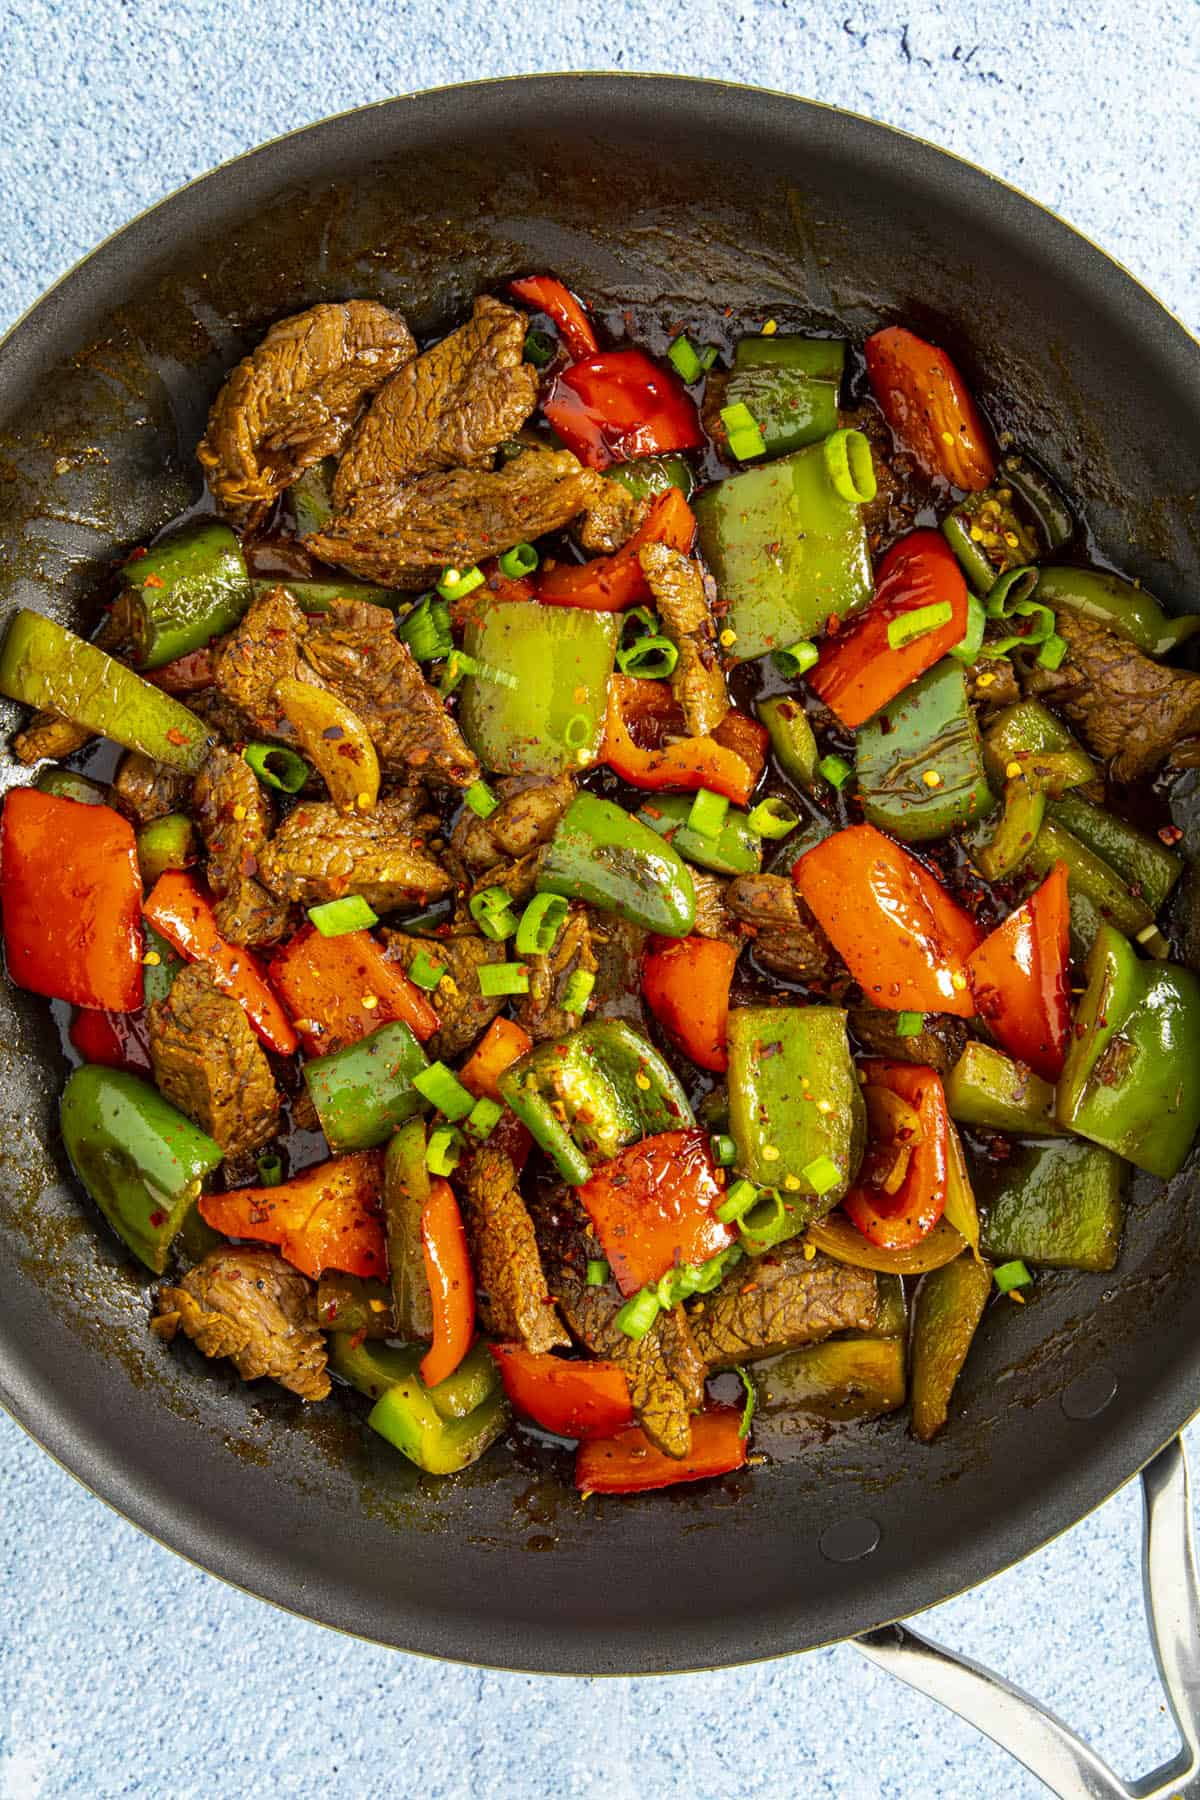 Pepper steak in a pan with garnish